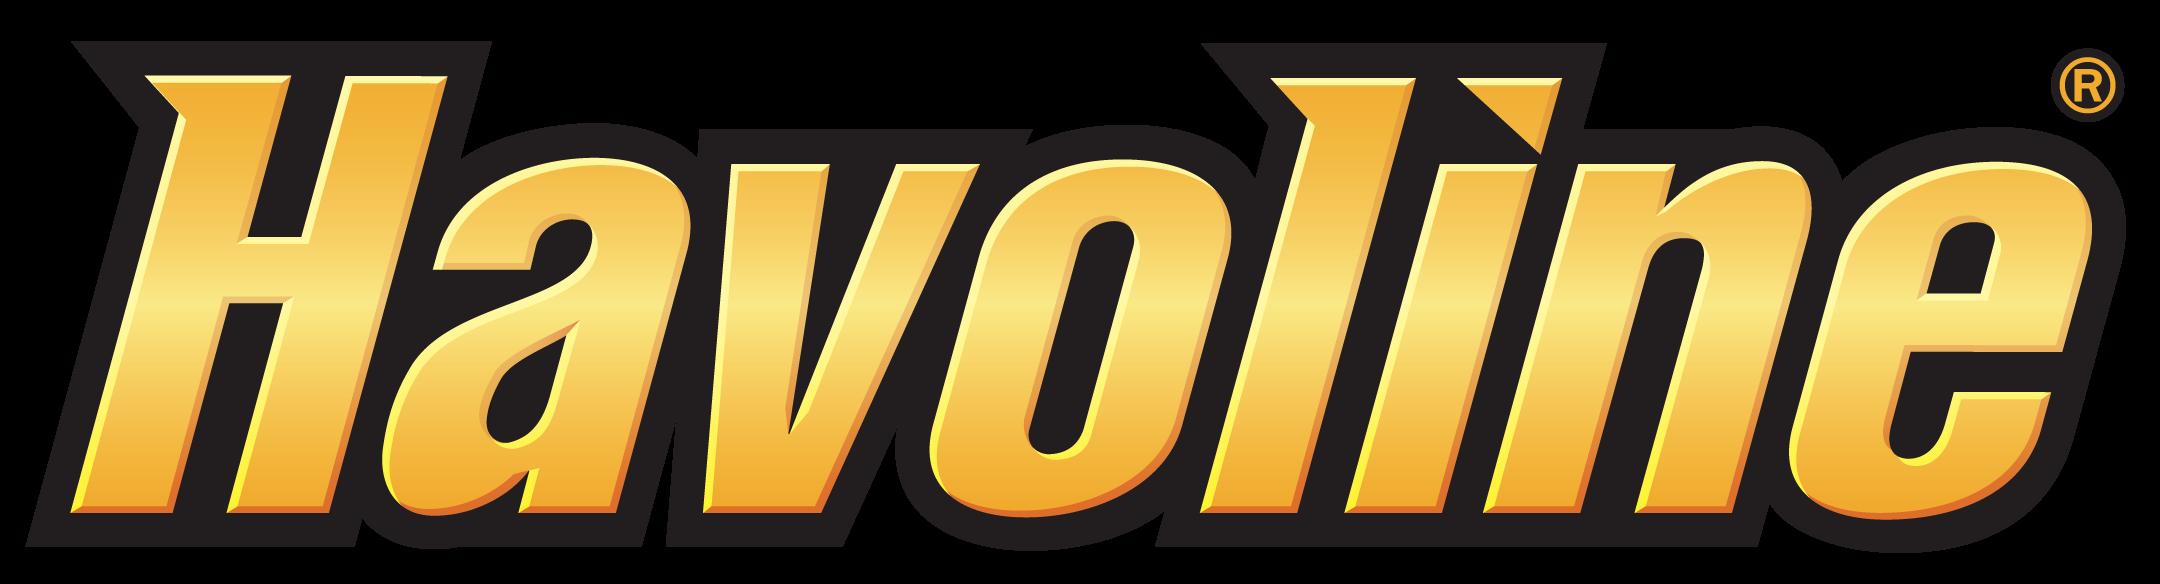 havoline logo 1 1 - Havoline Logo